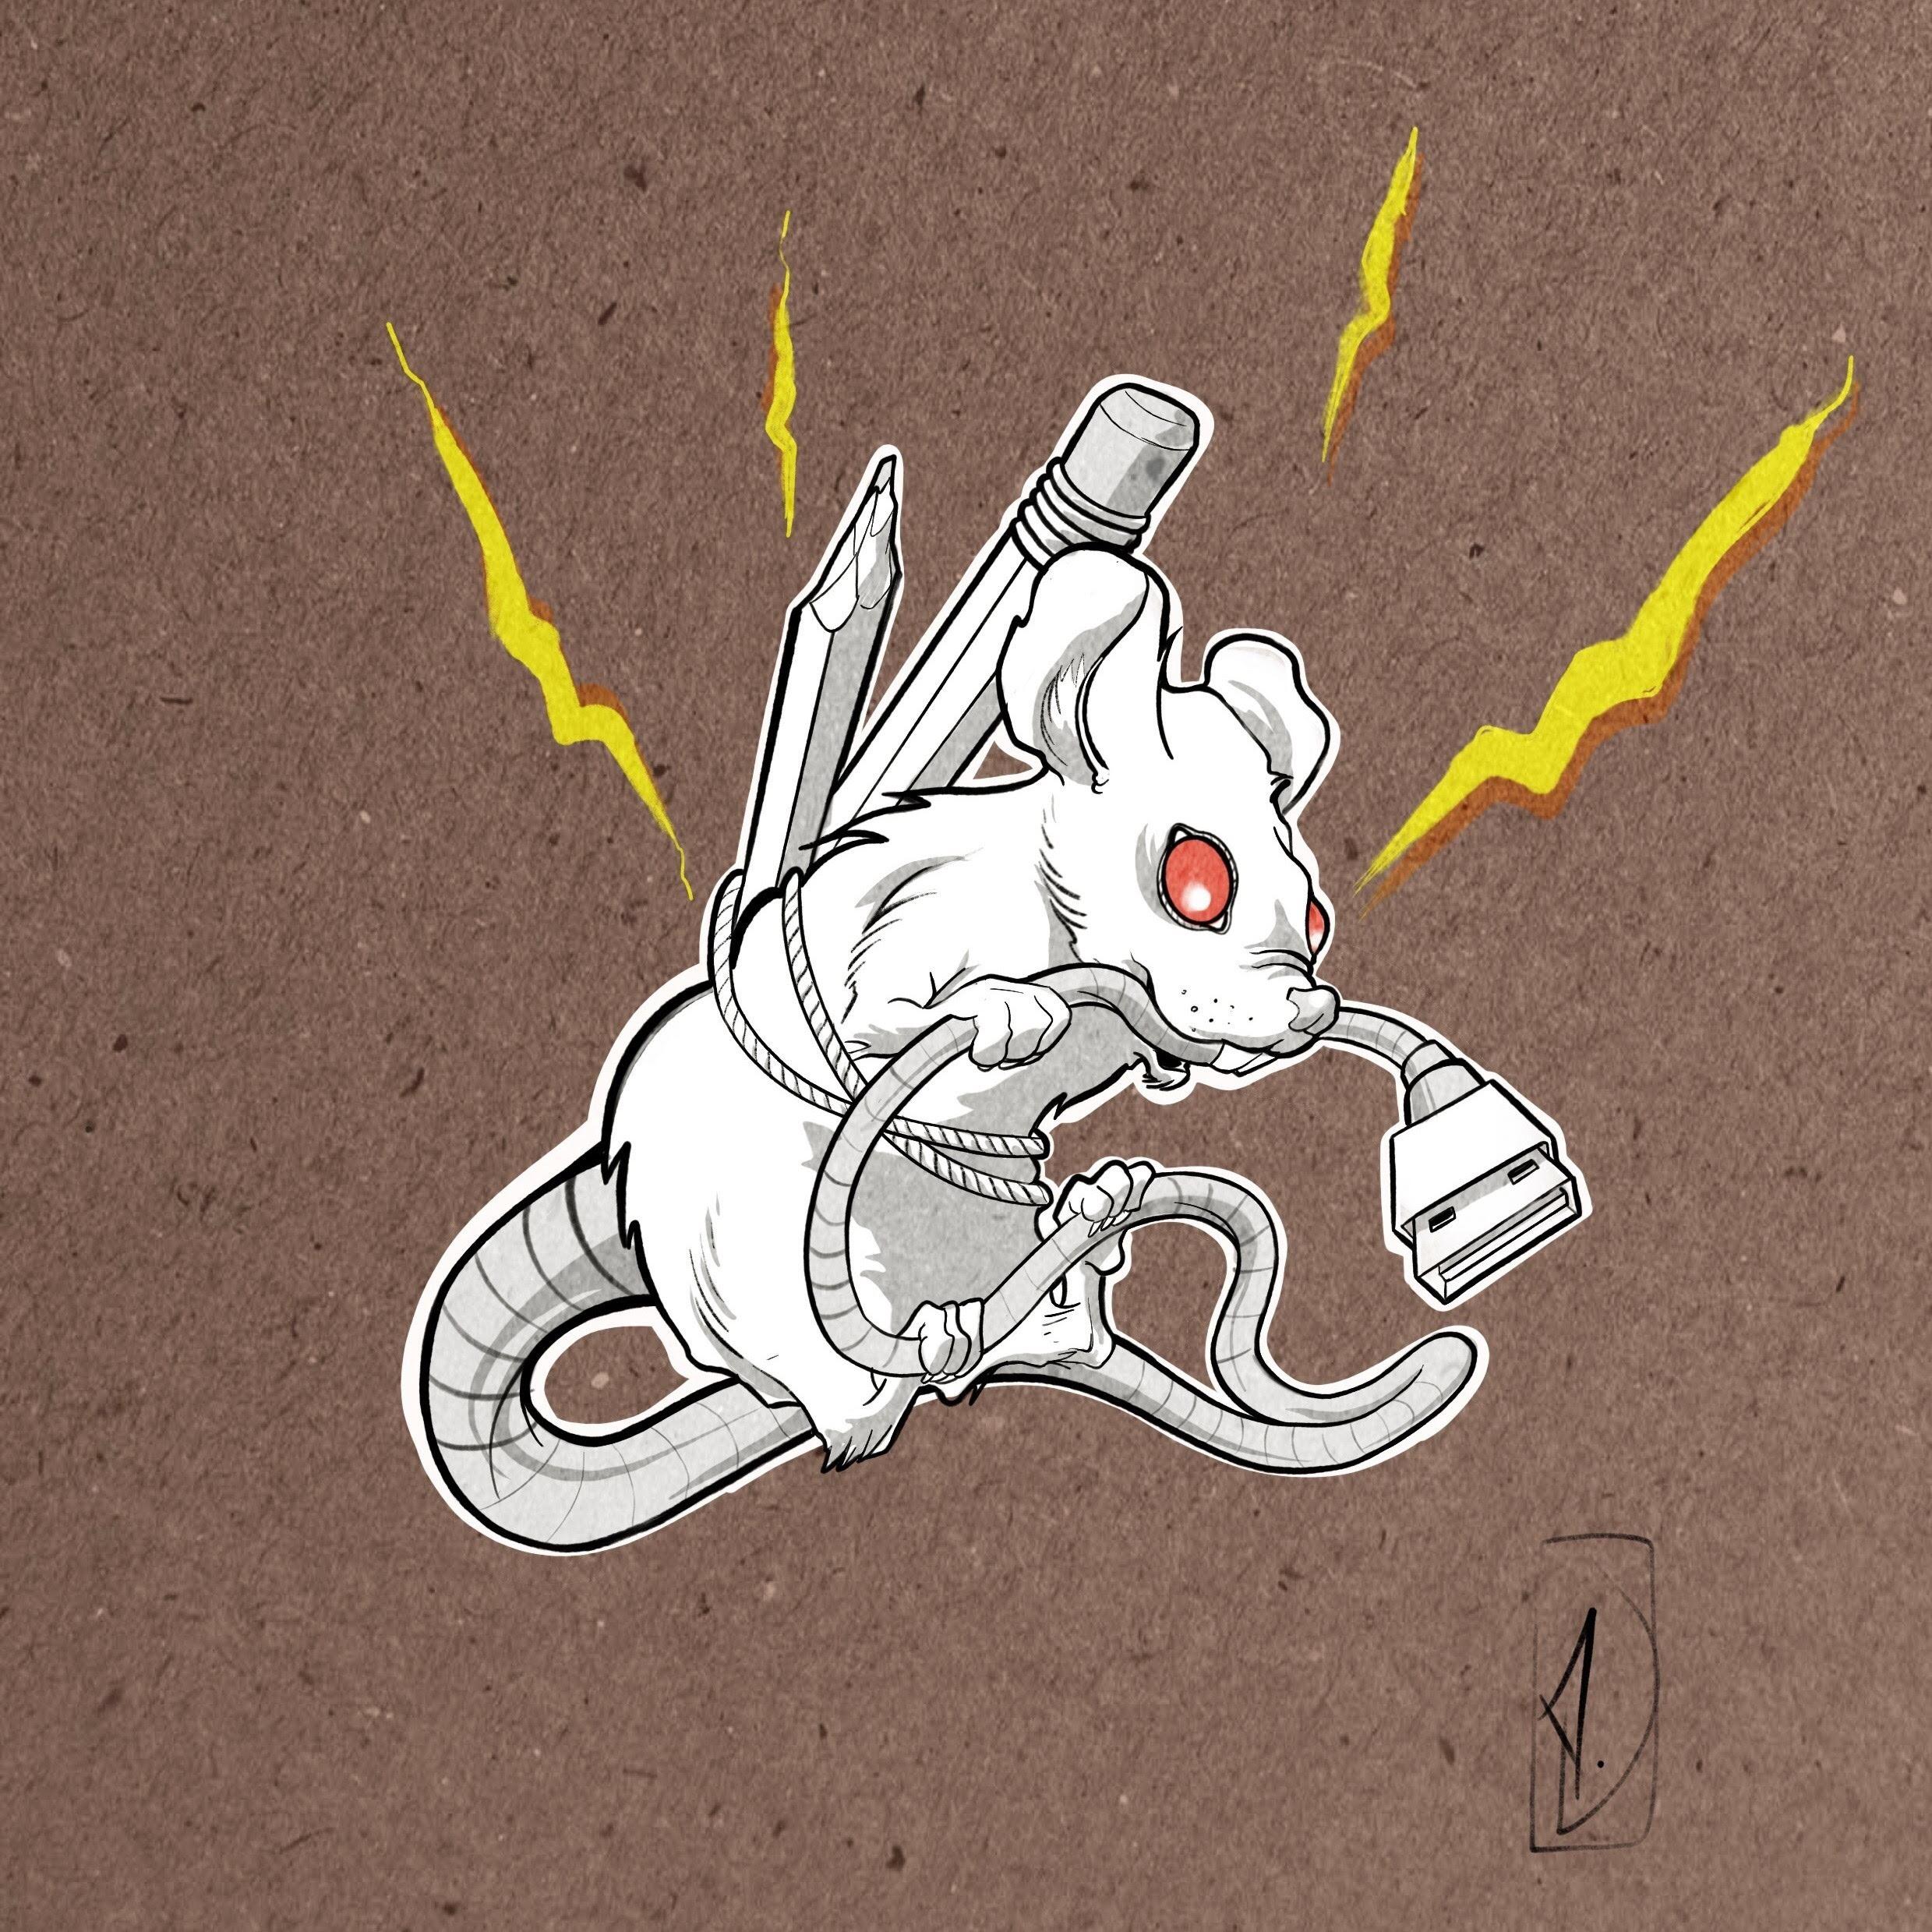 flash tattoo mouse USB souris lyon corbas